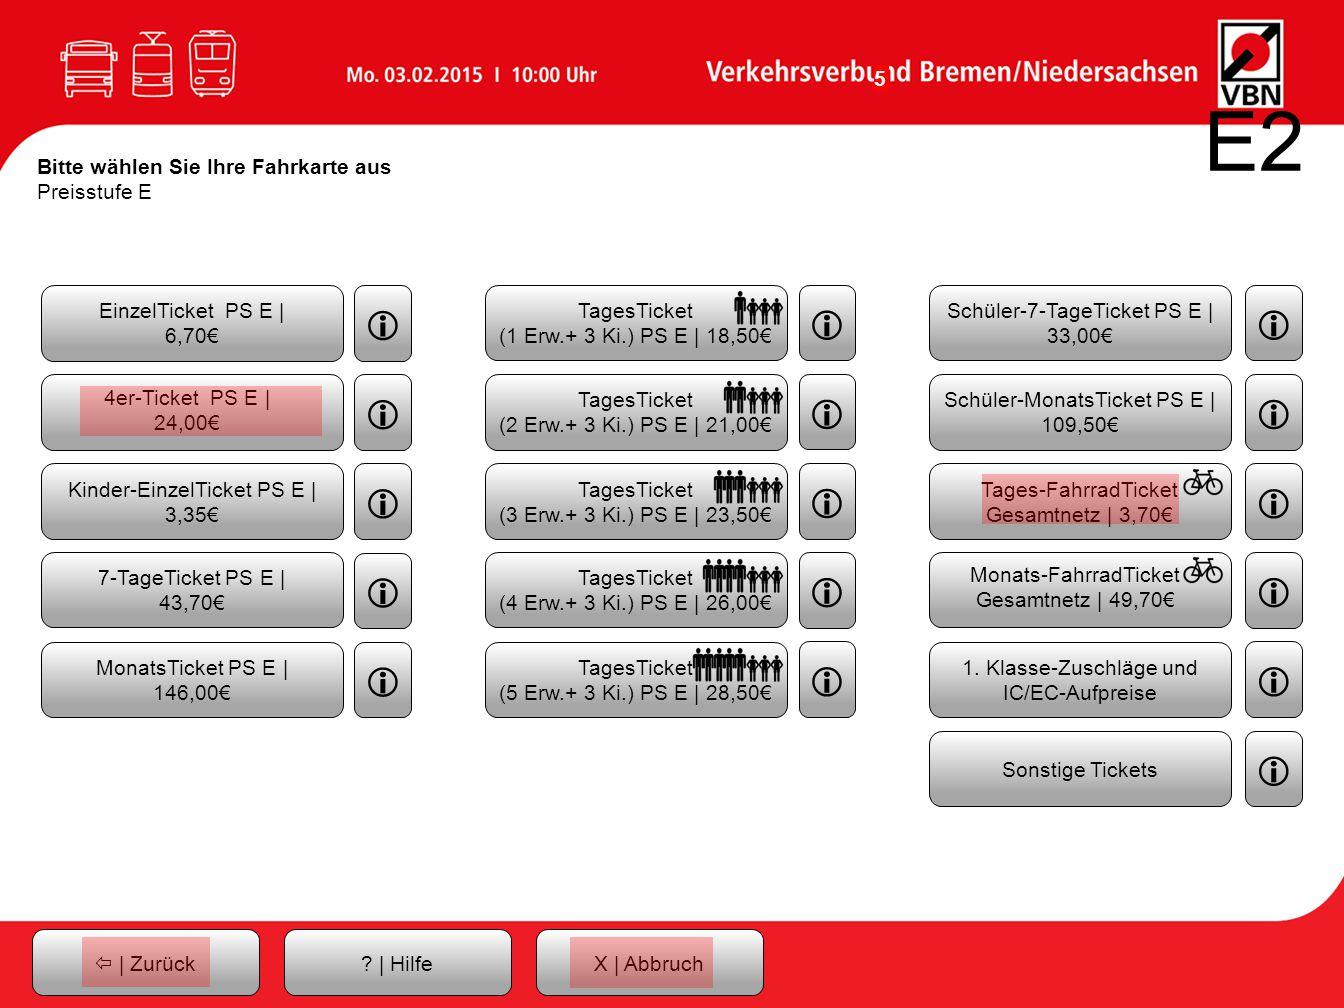 E2 Bitte wählen Sie Ihre Fahrkarte aus Preisstufe E. EinzelTicket PS E | 6,70€ i. TagesTicket (1 Erw.+ 3 Ki.) PS E | 18,50€